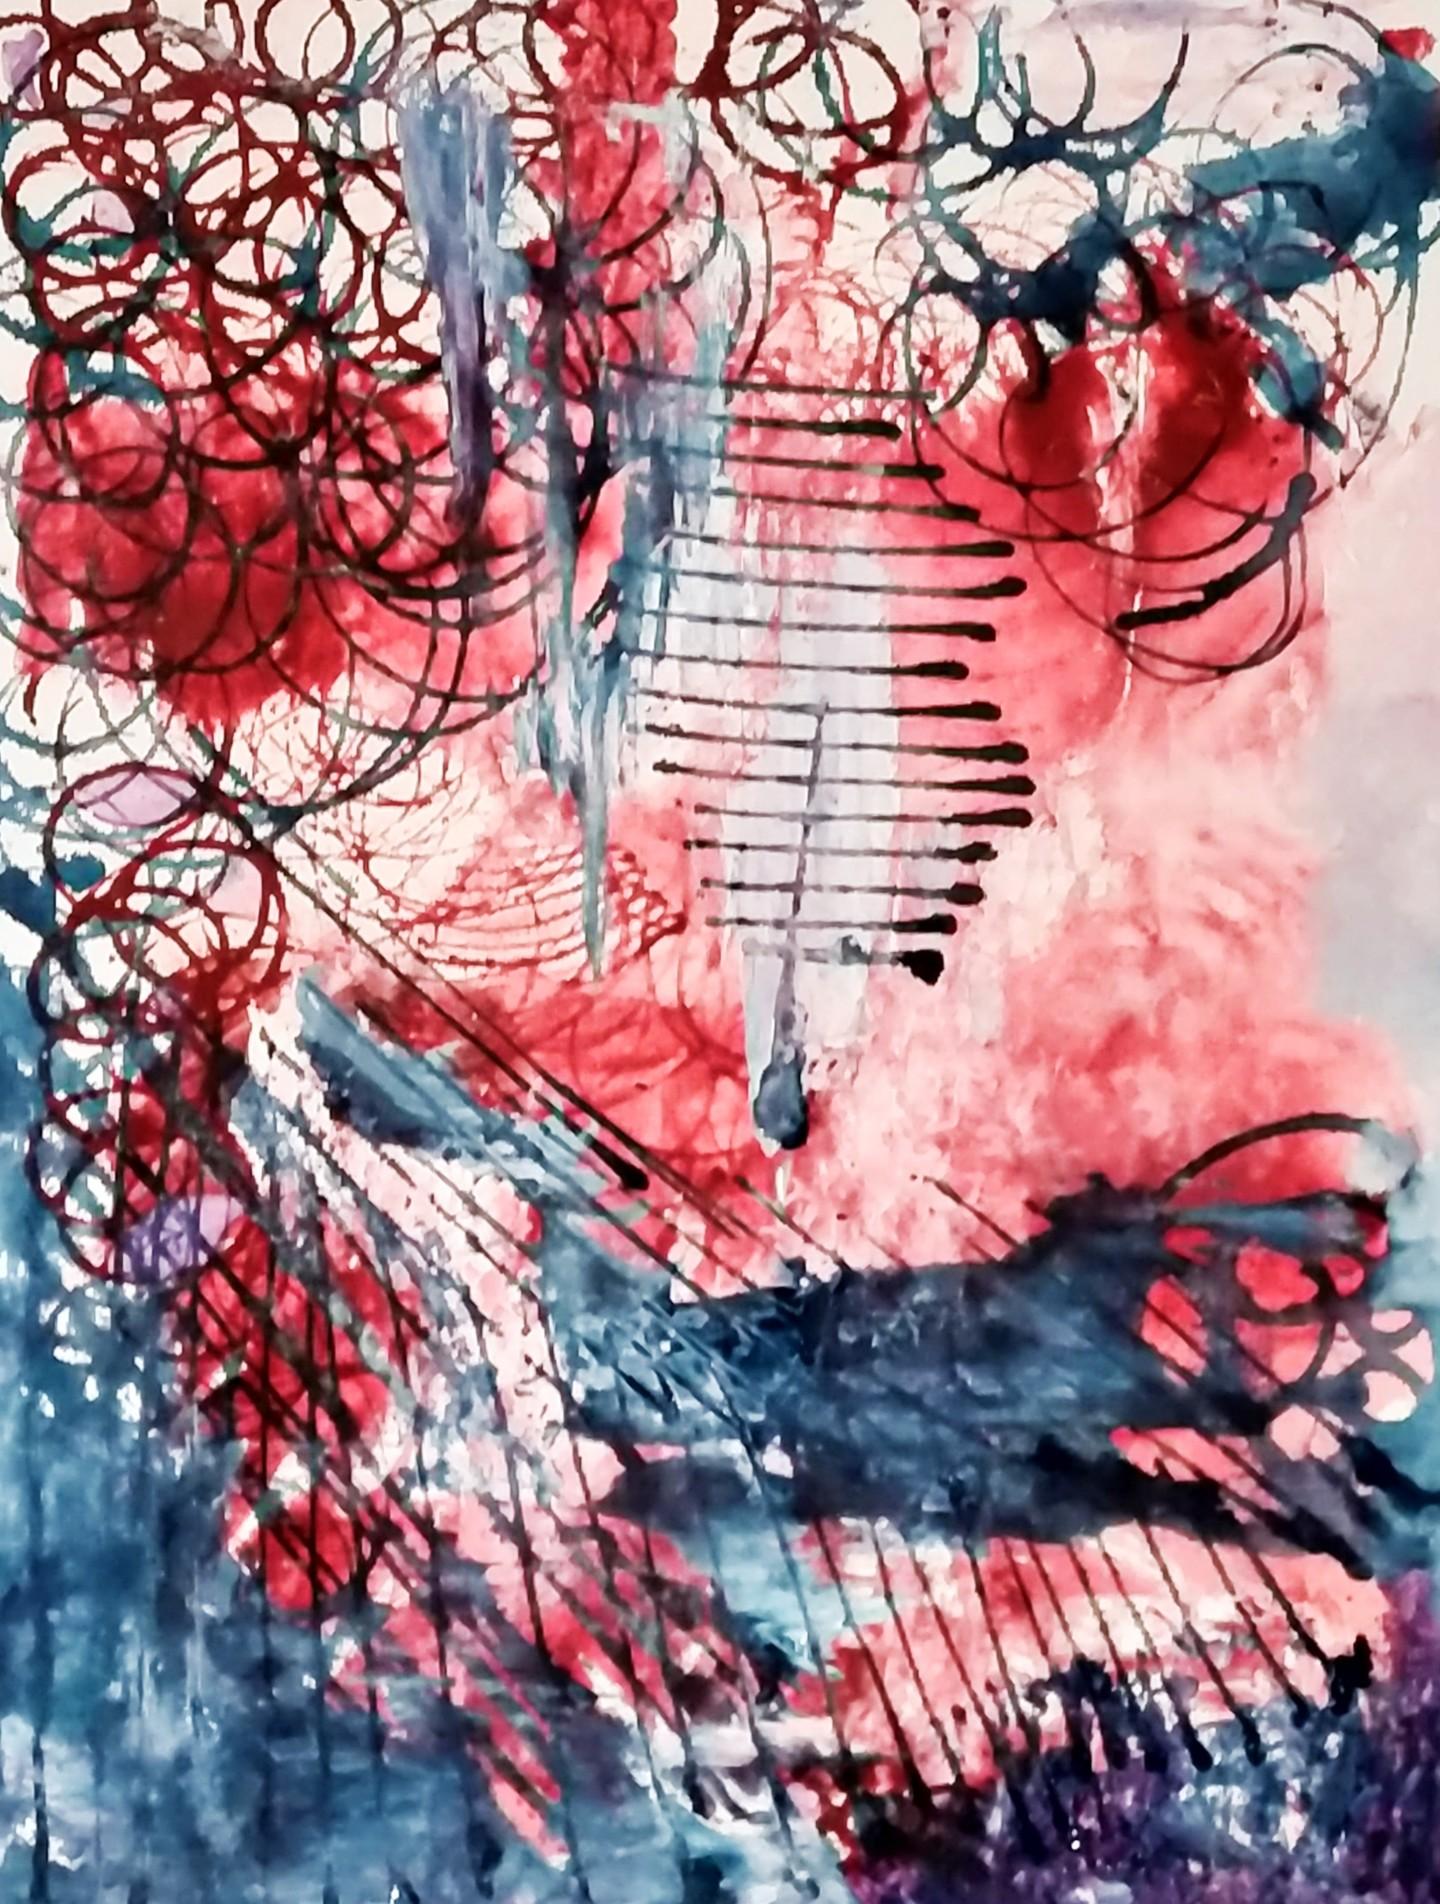 Atignas Art - Thorns of loneliness